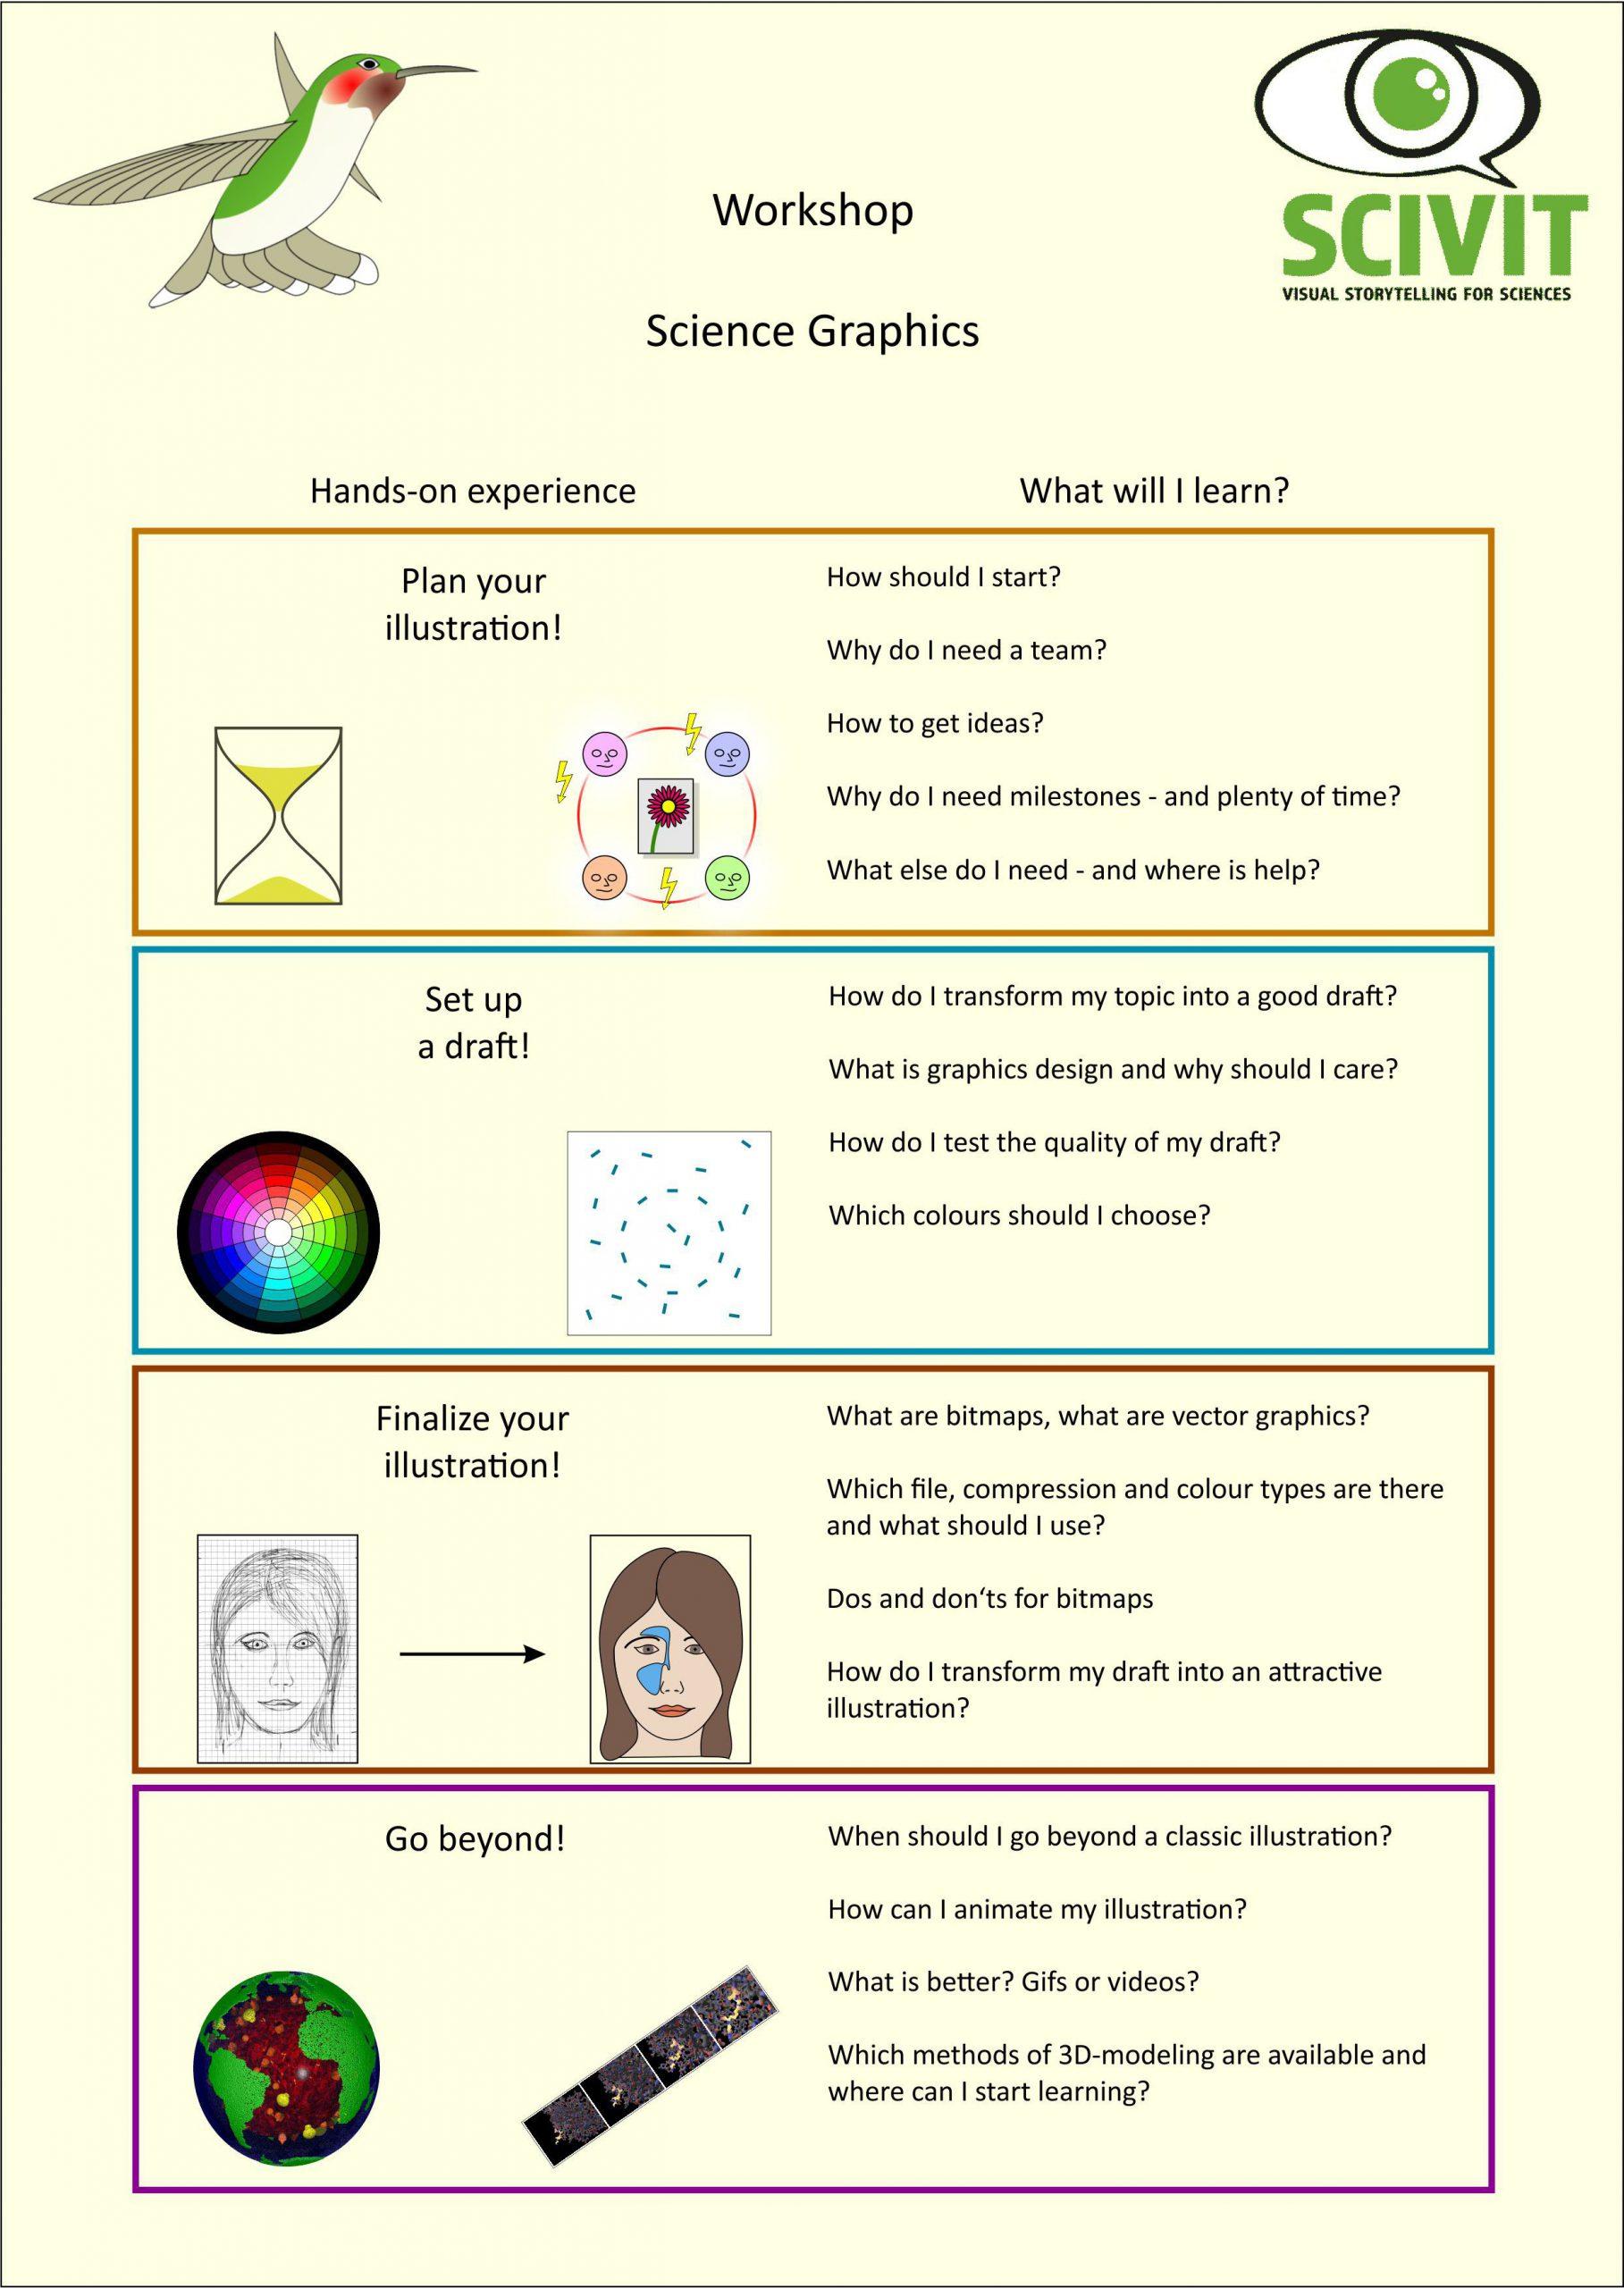 Workshop Science Graphics: Program